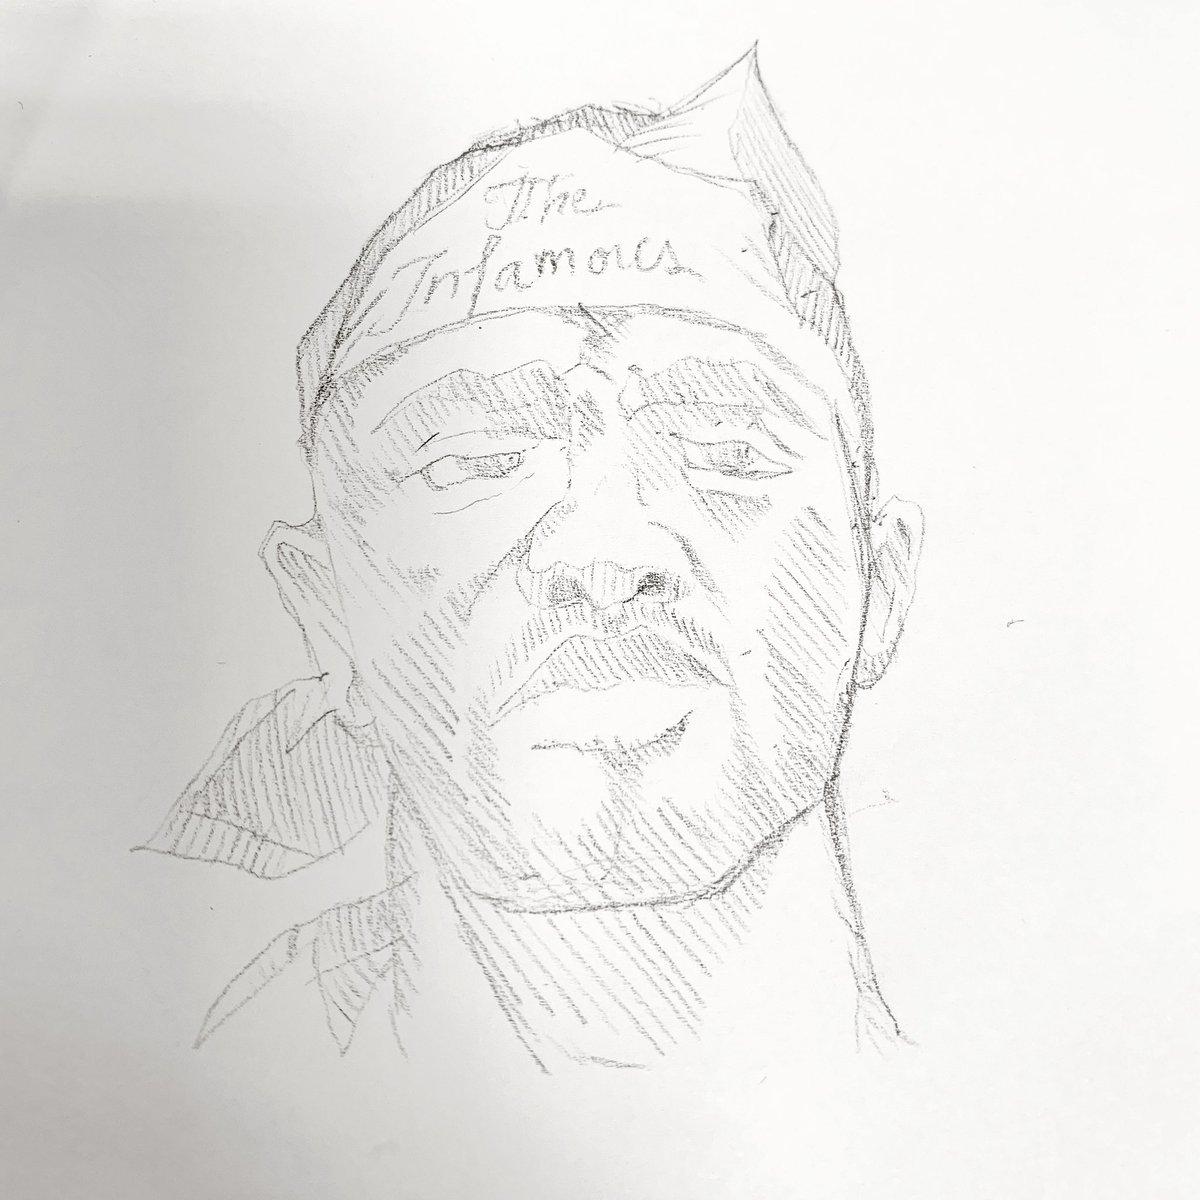 I GOT U STUCK OFF THE REALNESS, WE BE THE INFAMOUS... #MobbDeep #Prodigy #Draw #Art #QB #NY #Sketchpic.twitter.com/daqpVgS0Ra